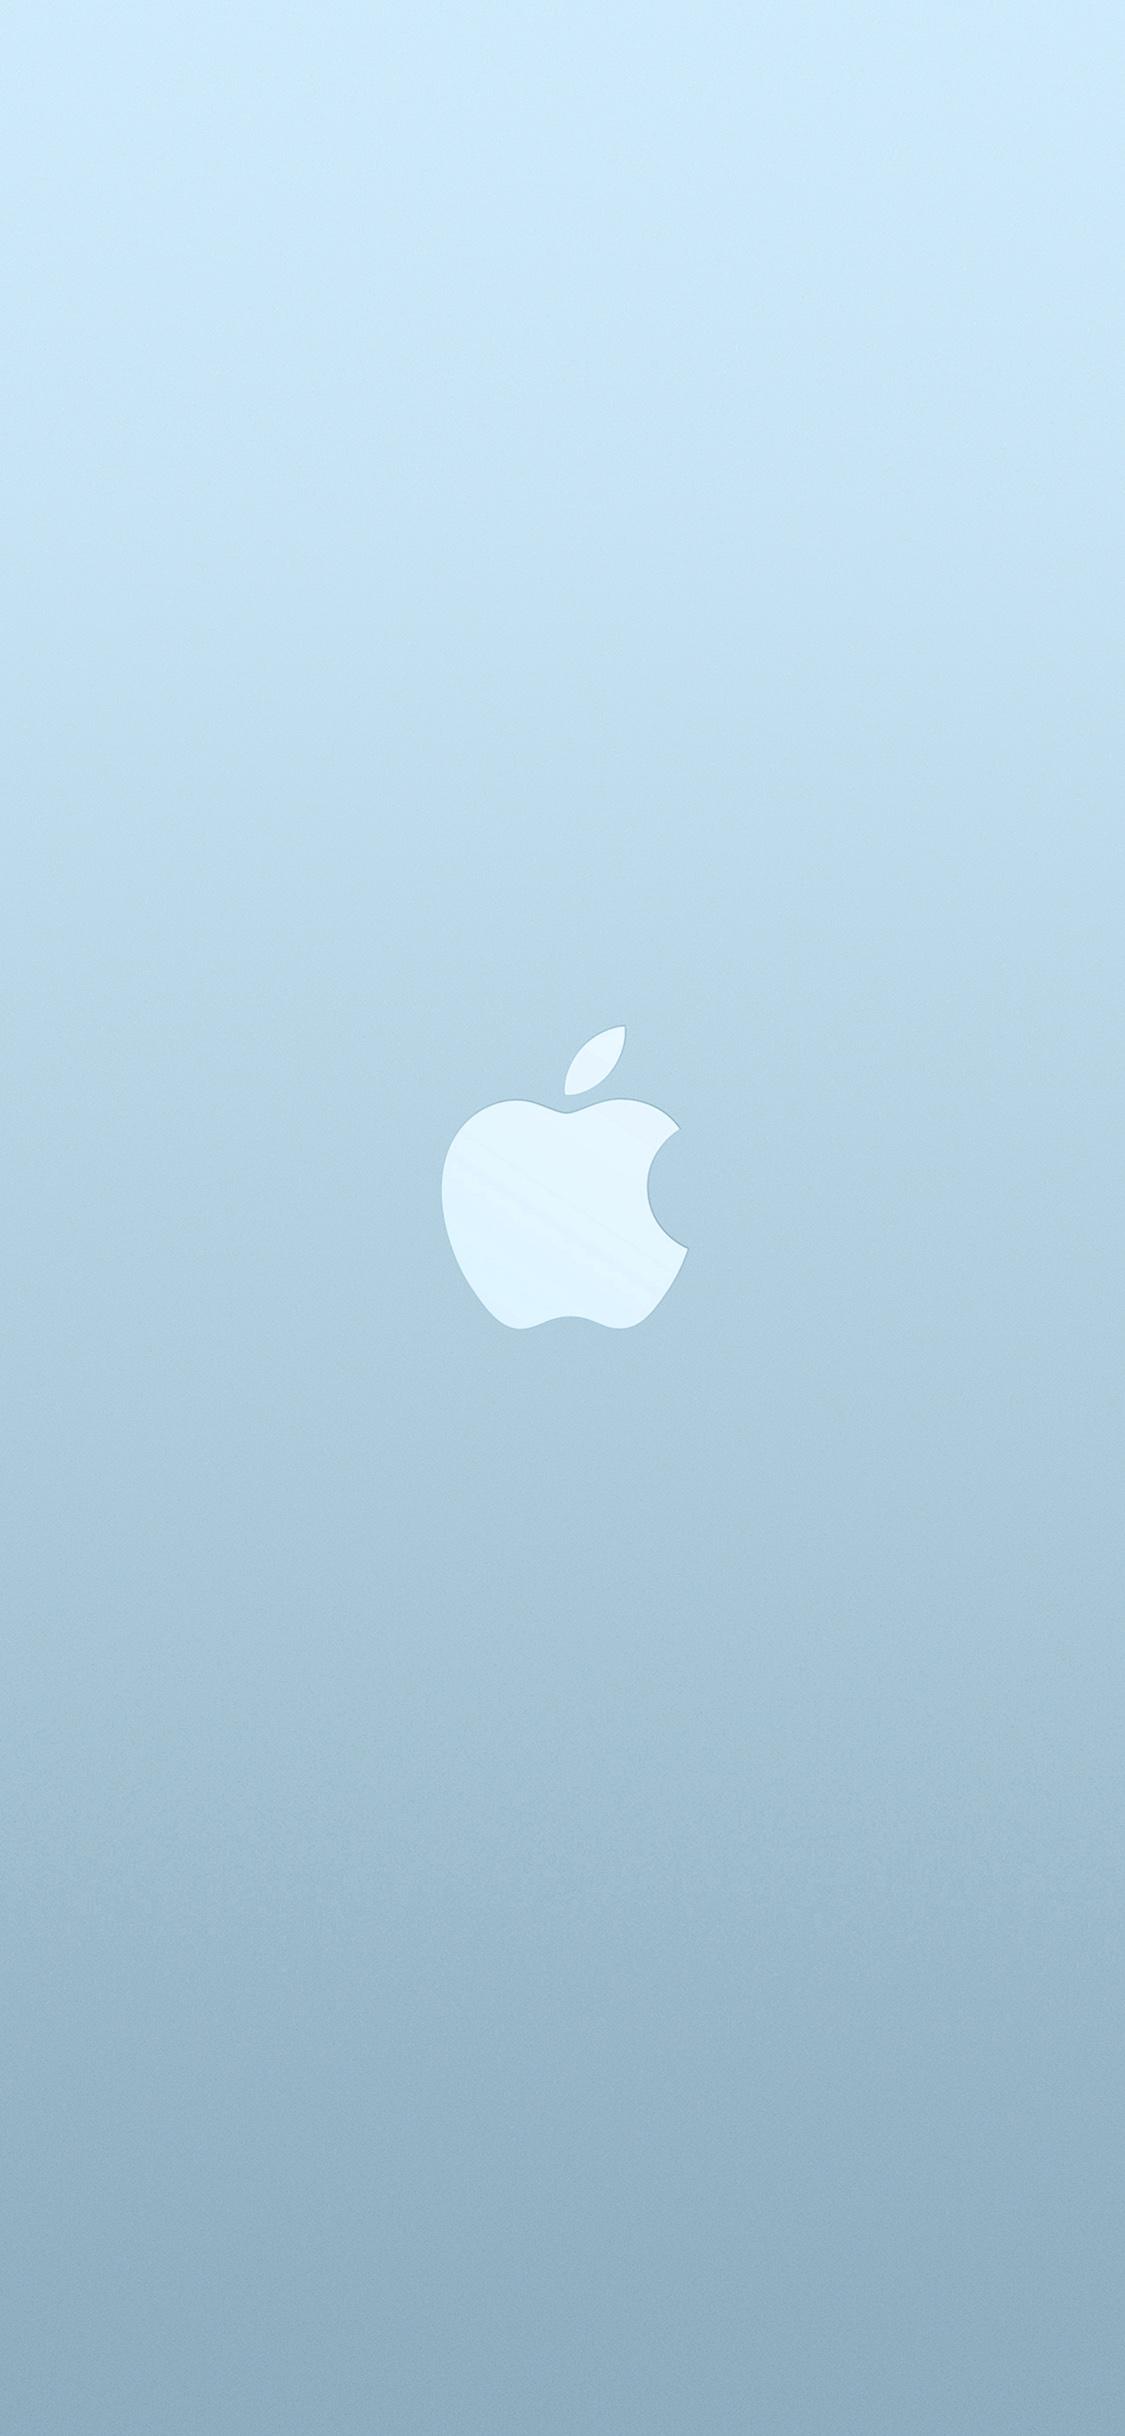 iPhoneXpapers.com-Apple-iPhone-wallpaper-au16-logo-apple-blue-white-minimal-illustration-art